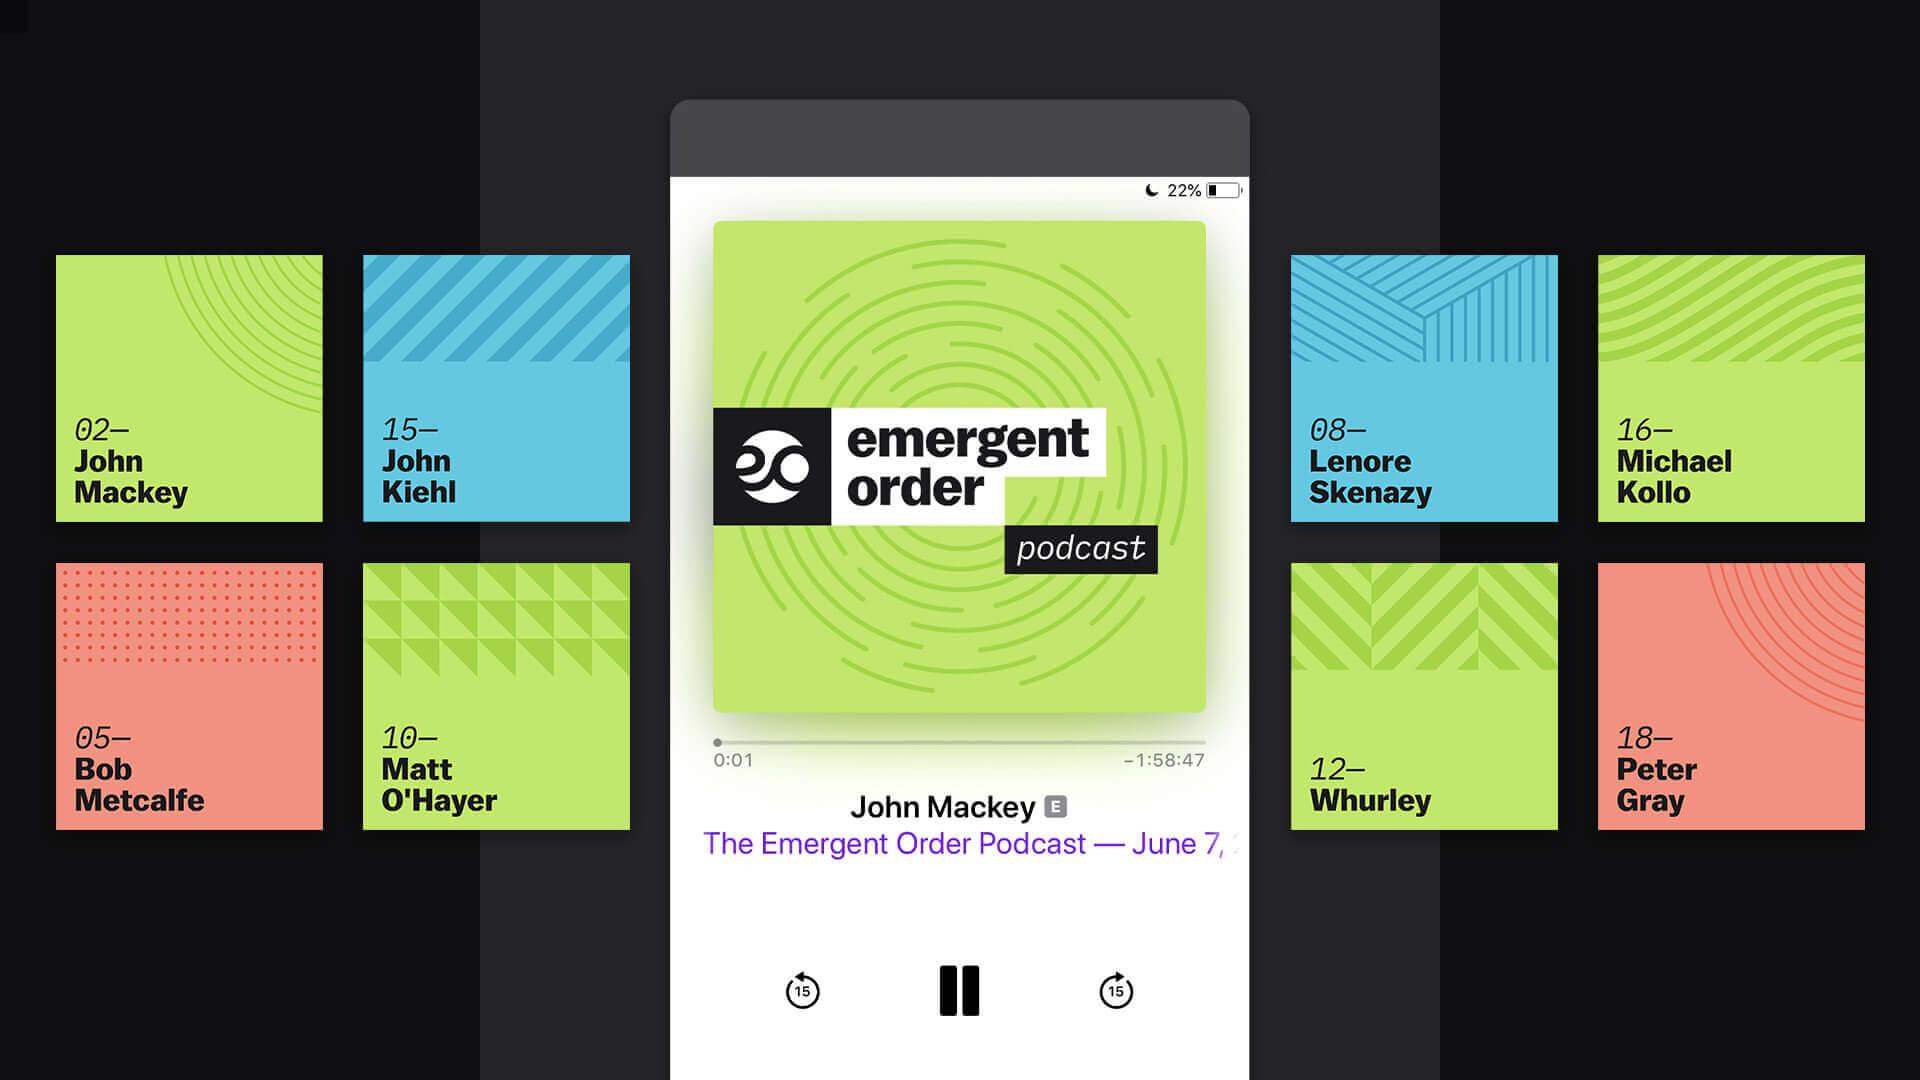 studio-malagon-emergent-order-podcast-02